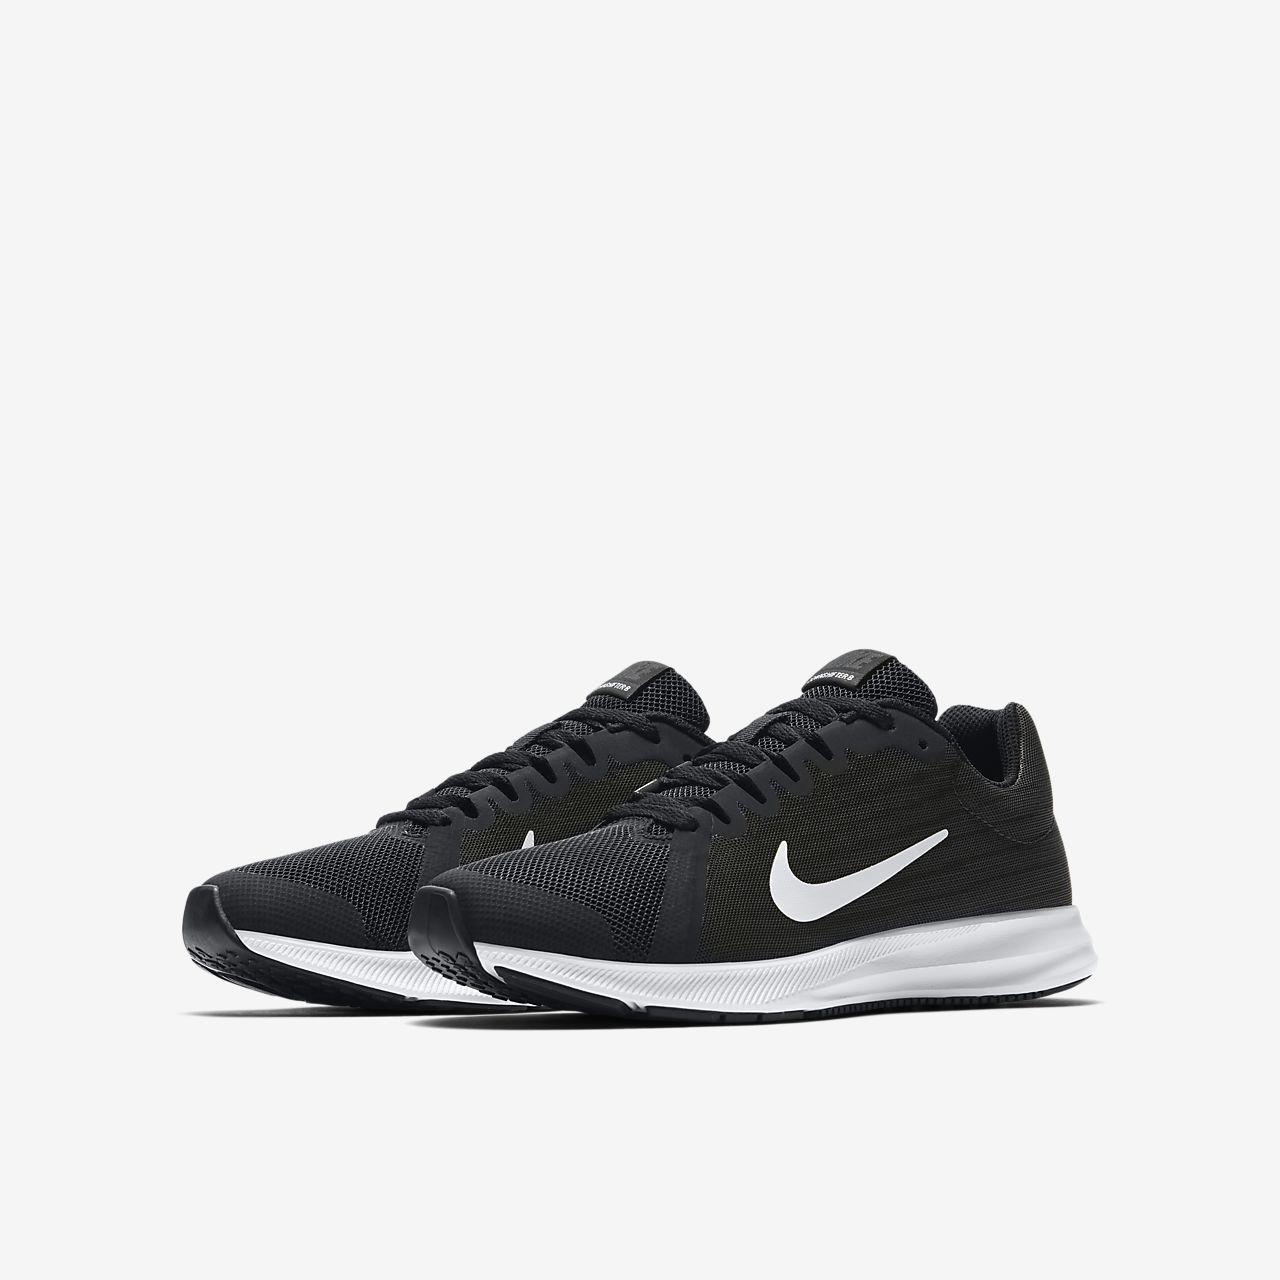 the latest 8e882 b07aa ... Nike Downshifter 8 Zapatillas de running - Niño